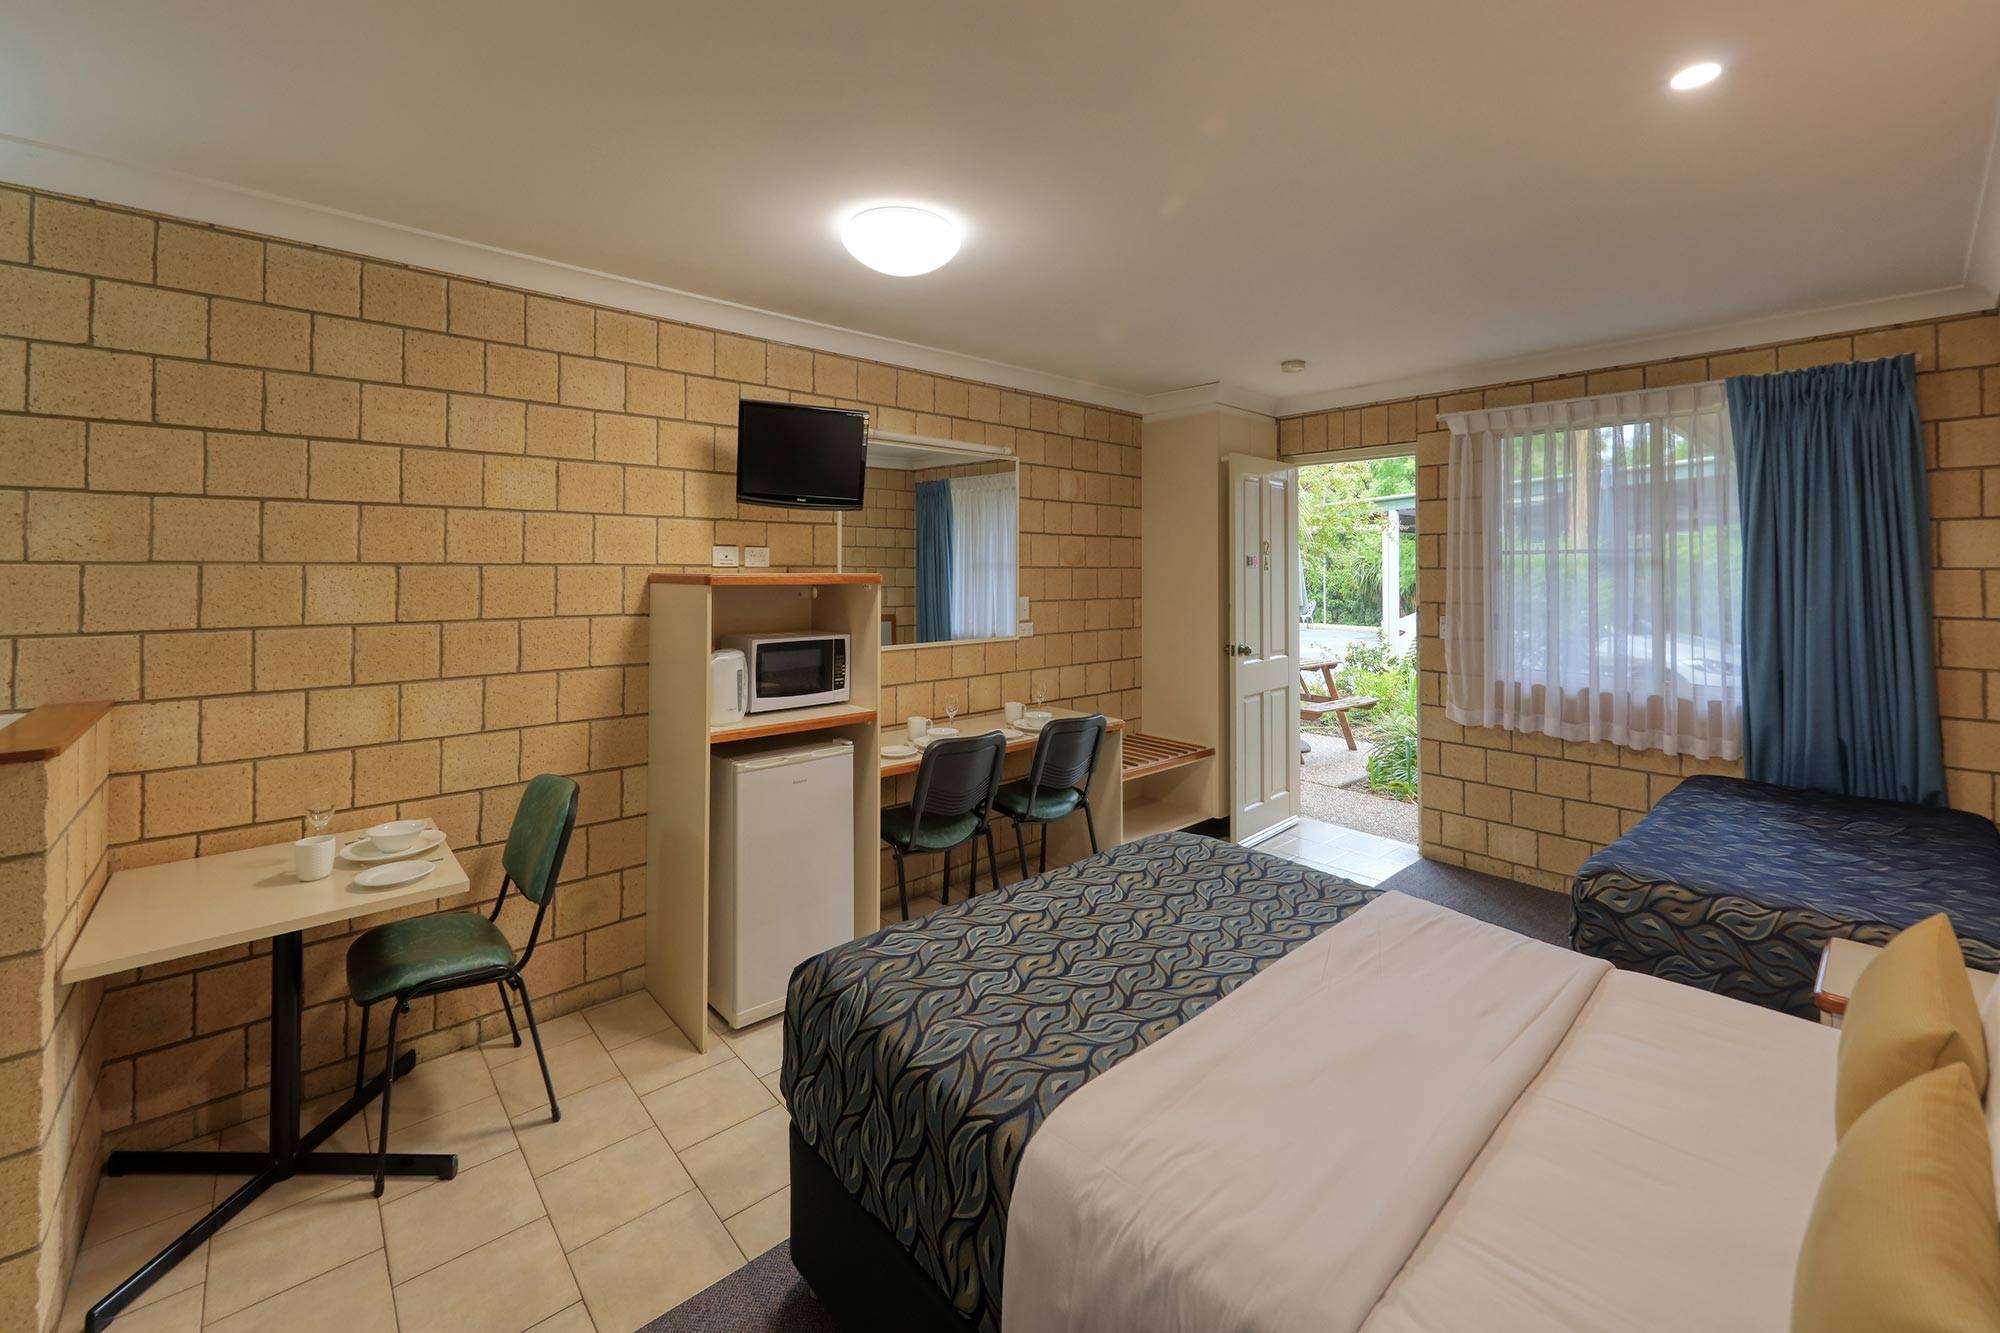 st-george-motel-family-room-(2)